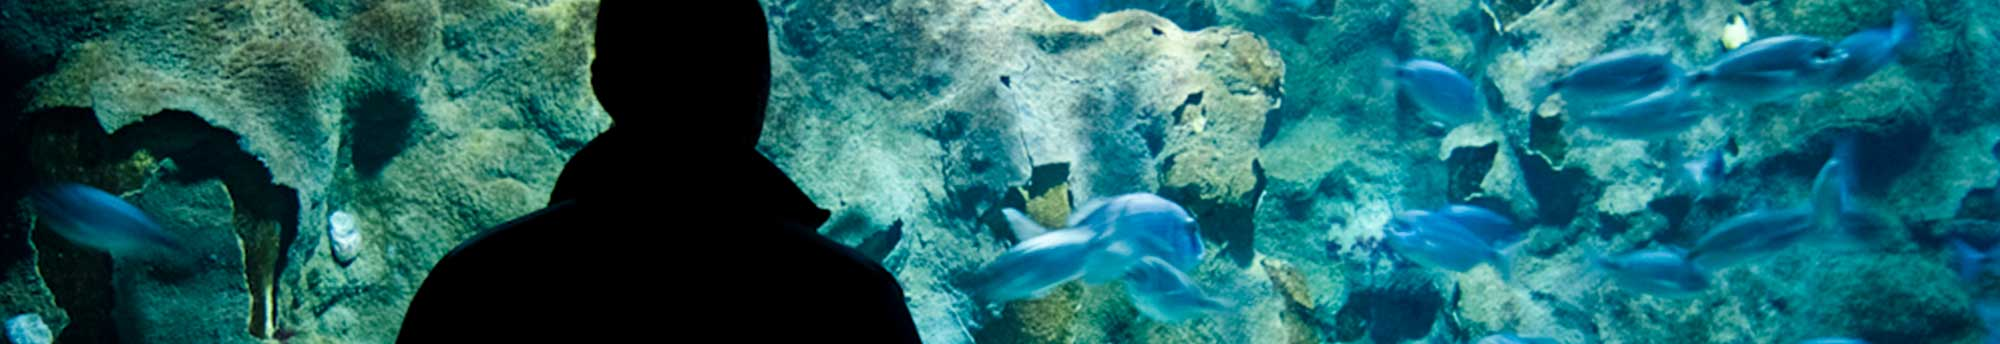 Hotel + Entradas al Aquarium Donostia-San Sebastián